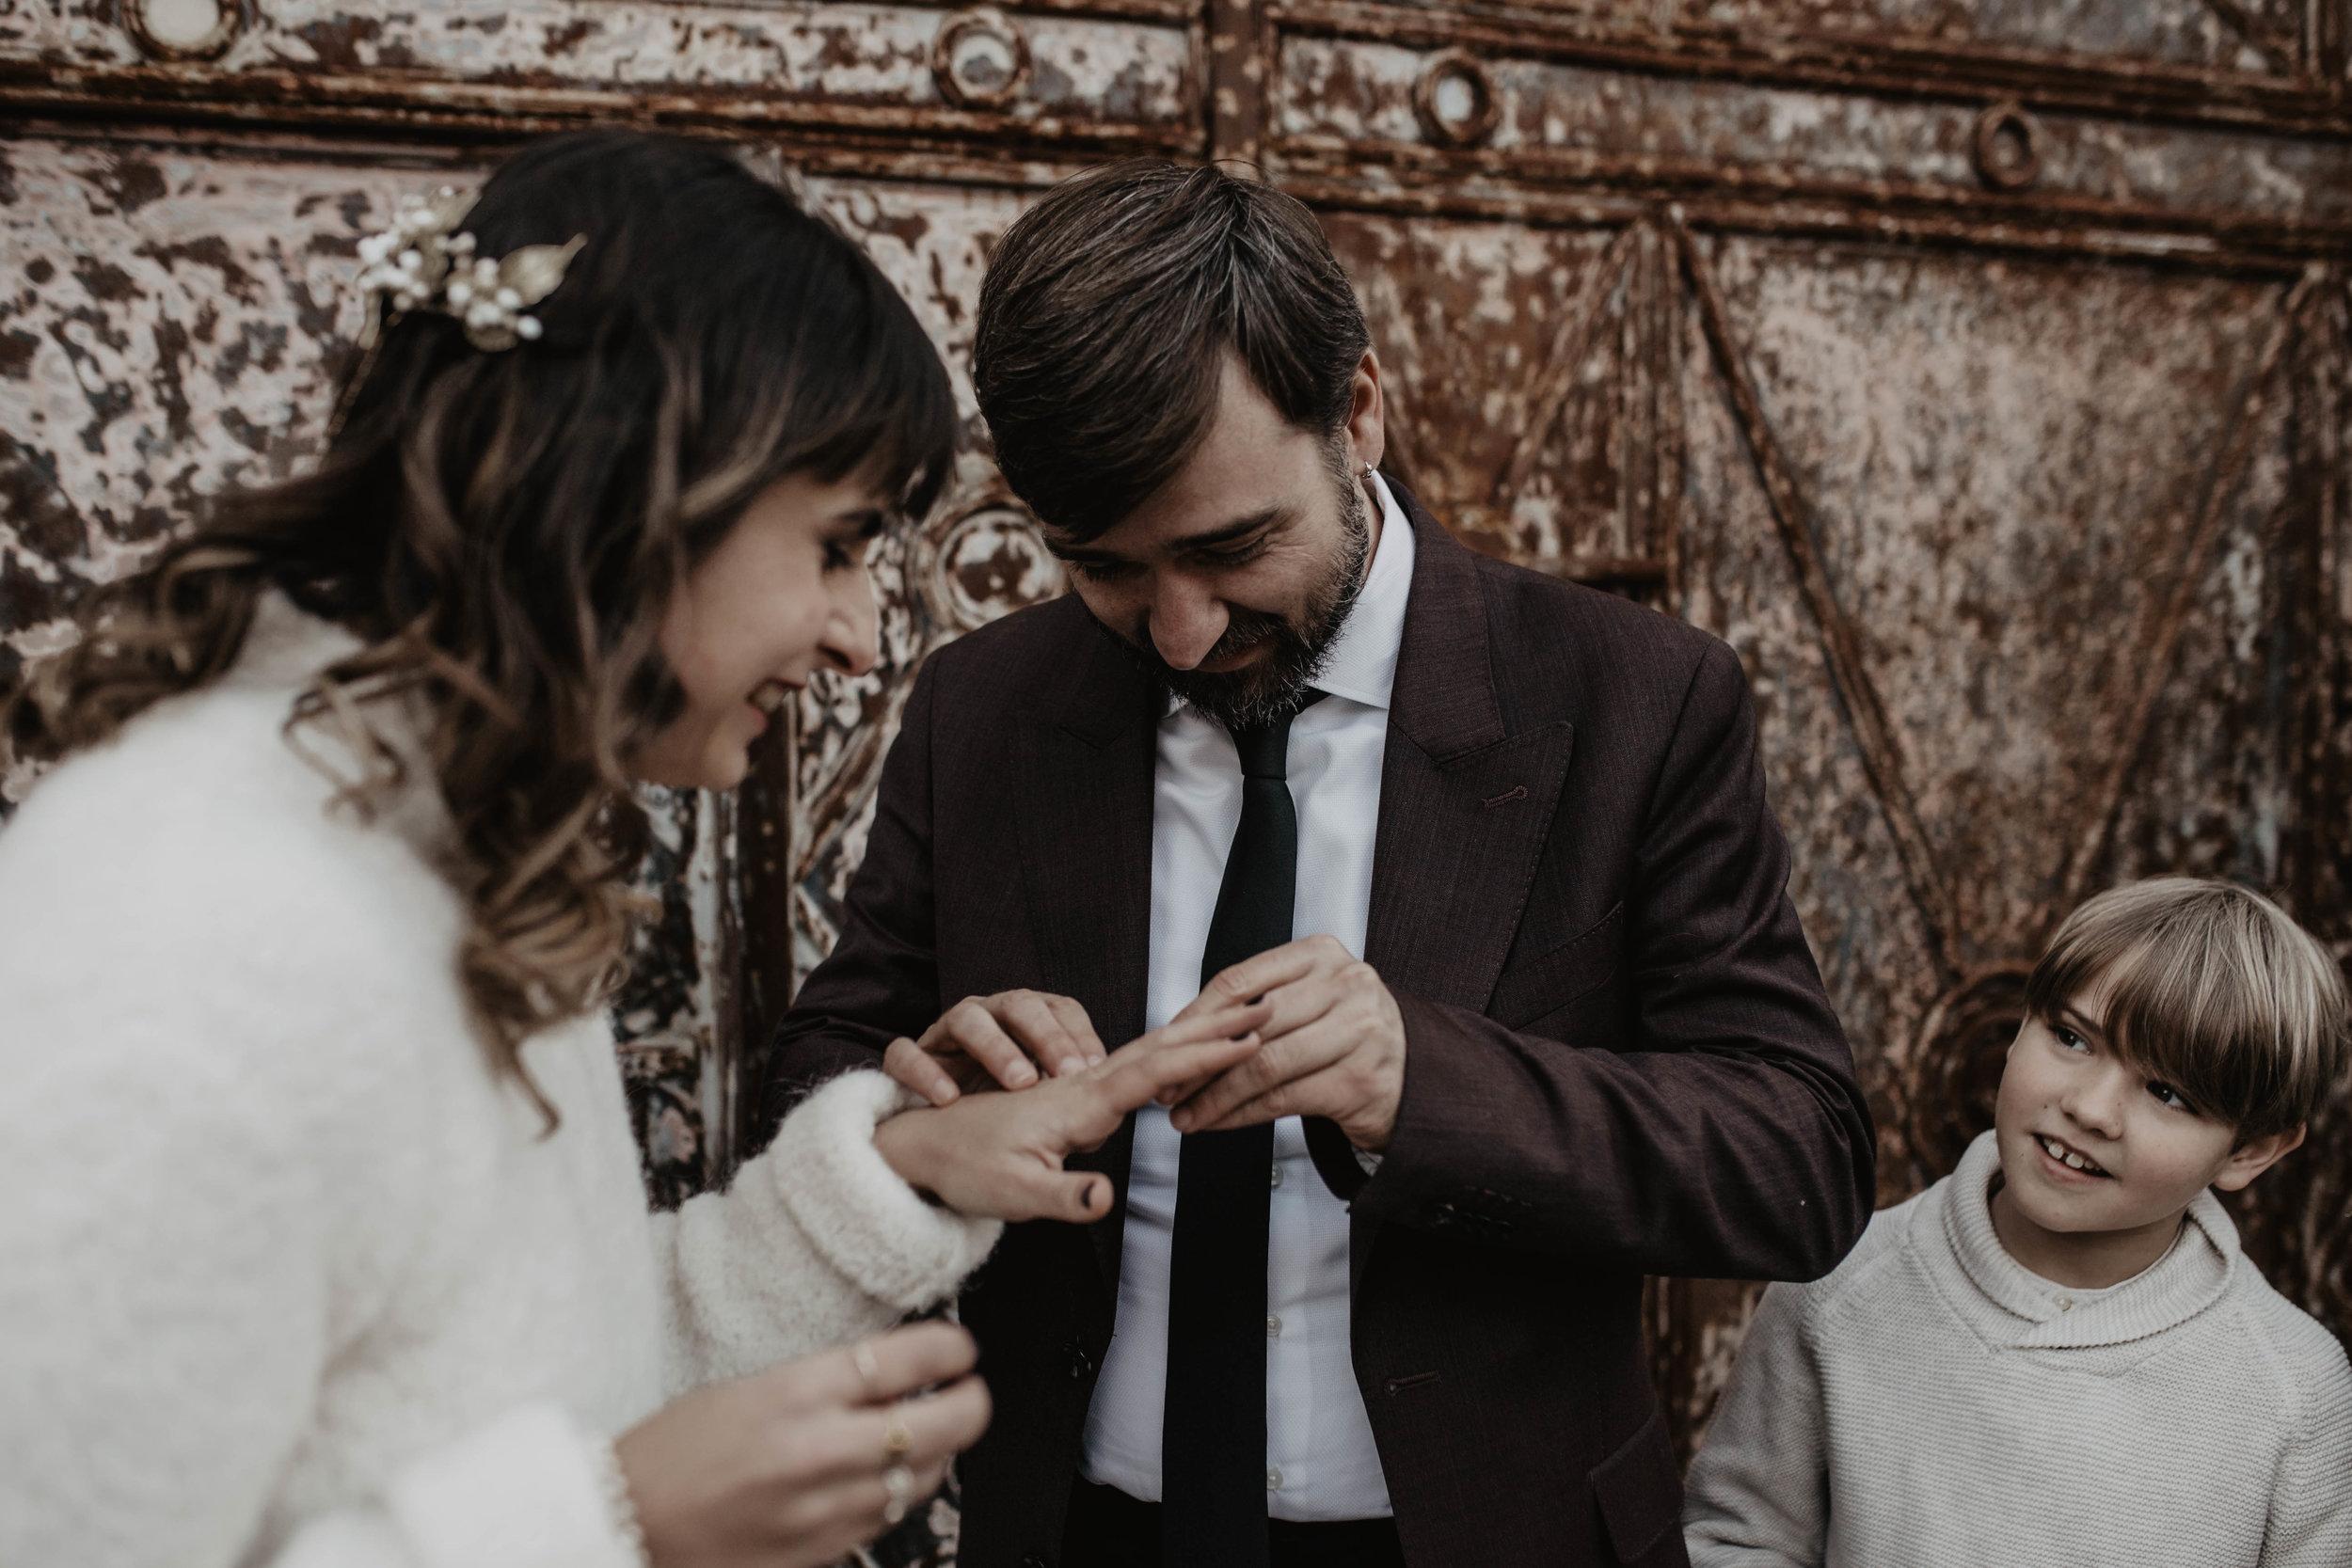 thenortherngirlphotography-photography-weddingphotography-couple-bodasconestilo-bodasenbarcelona-martadavid-648.jpg